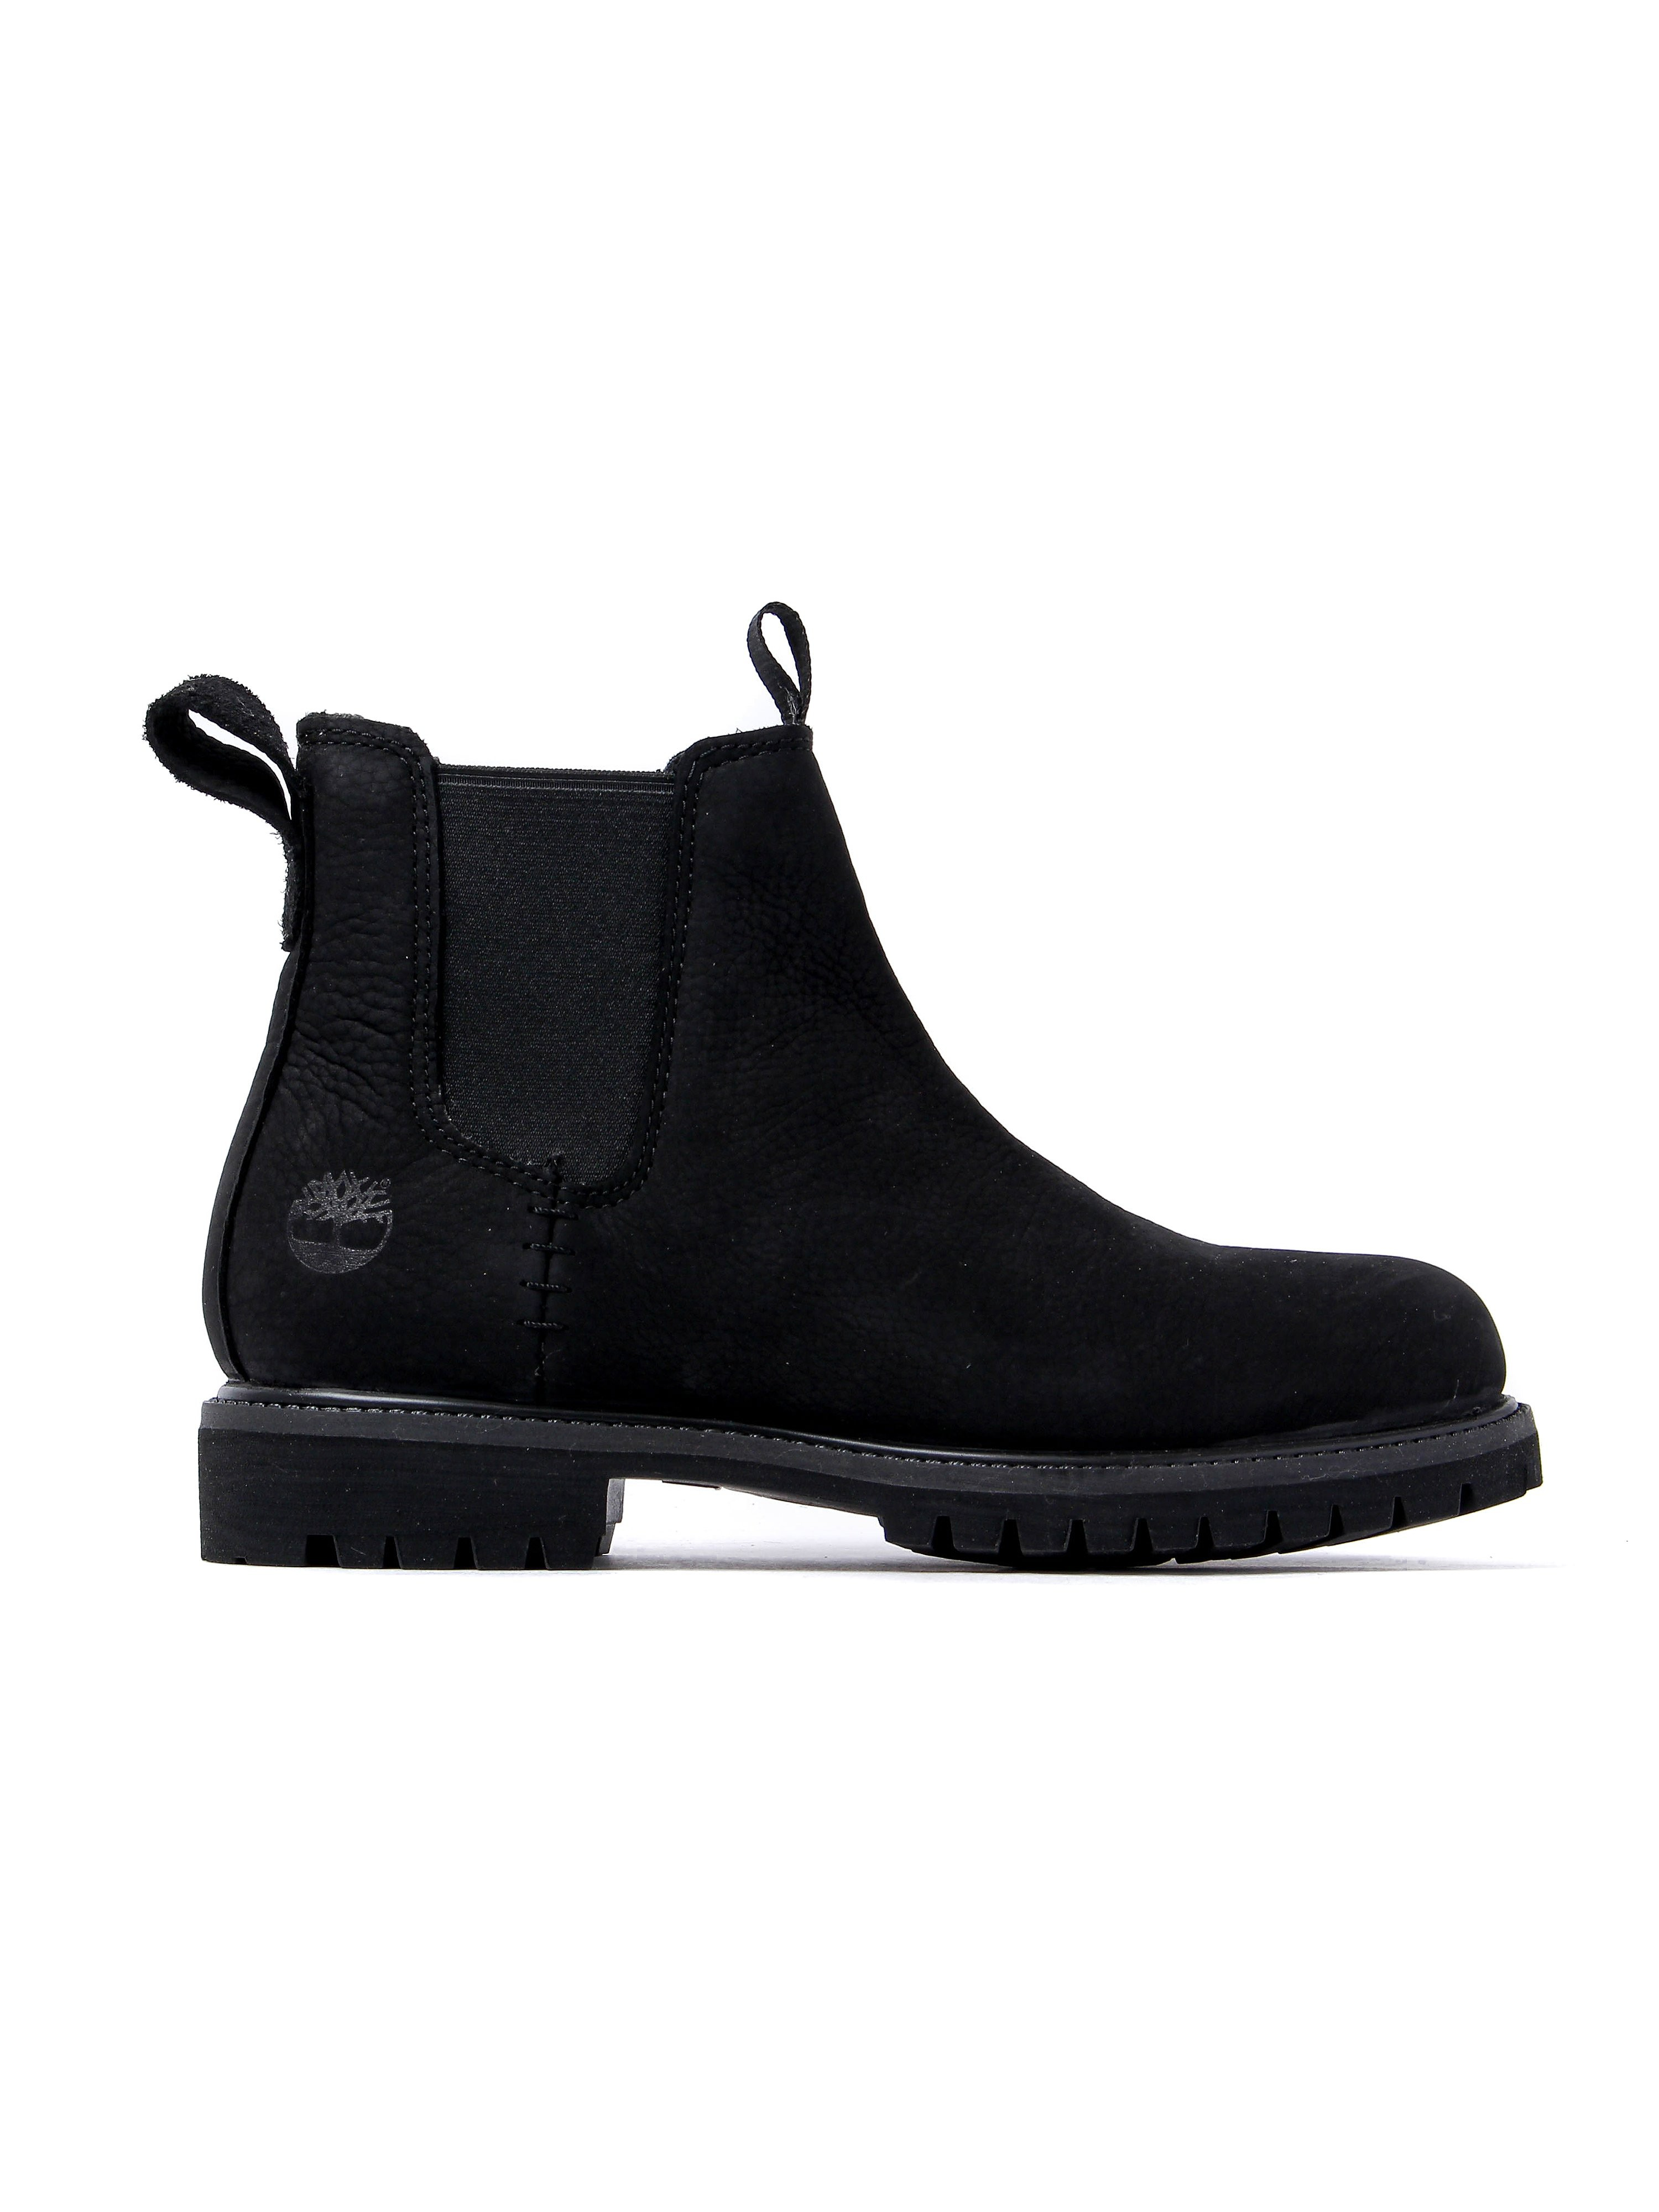 Timberland Men's 6 Inch Premium Chelsea Boots - Jet Black Nubuck